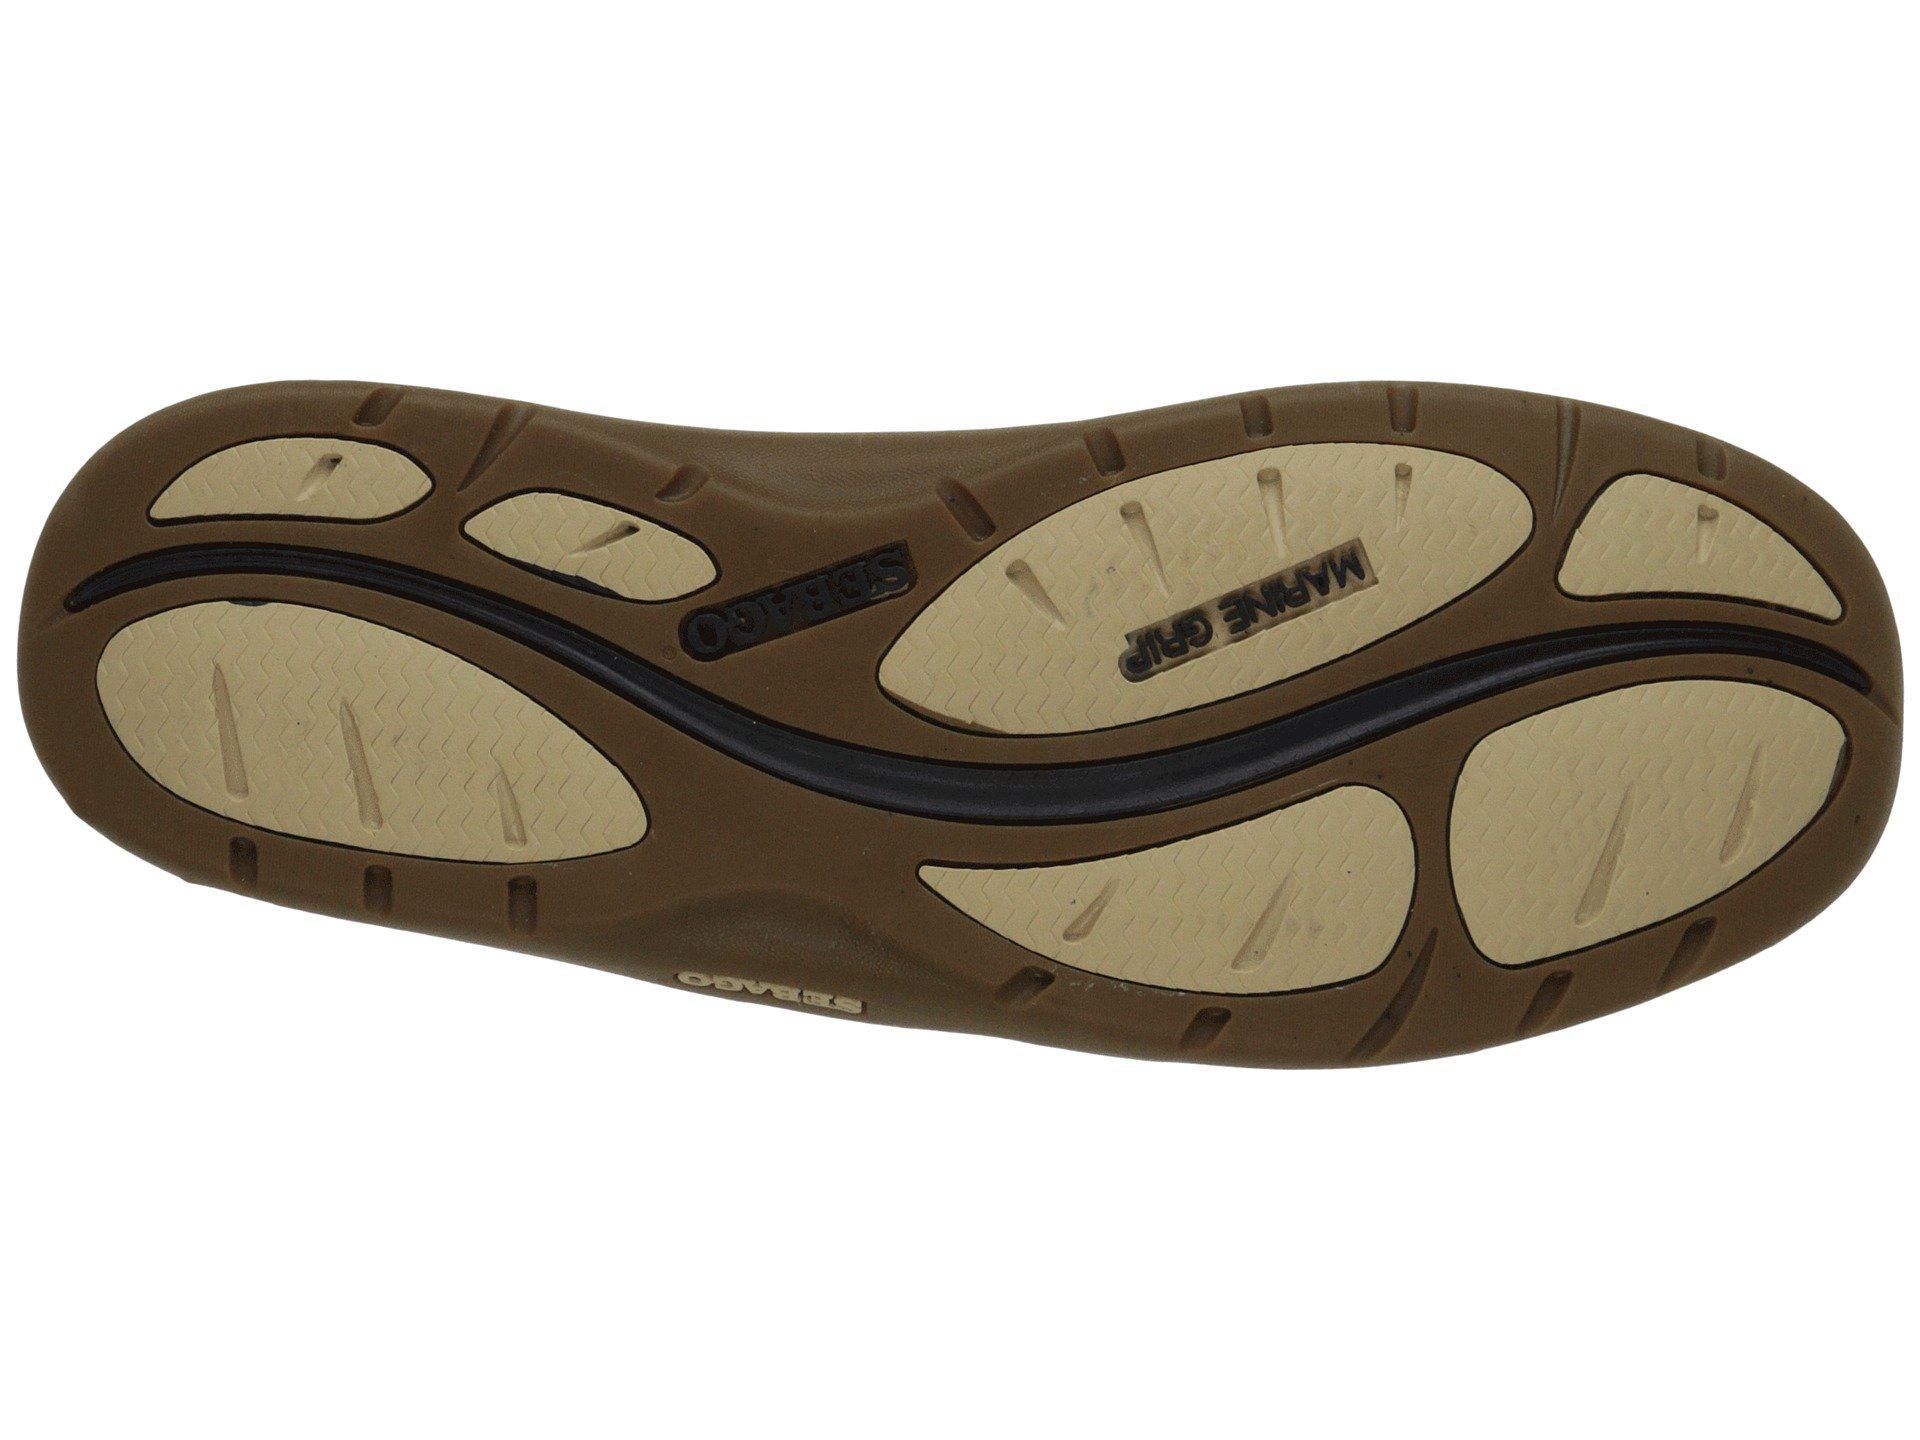 Sebago Clovehitch Slip On In Brown For Men Lyst